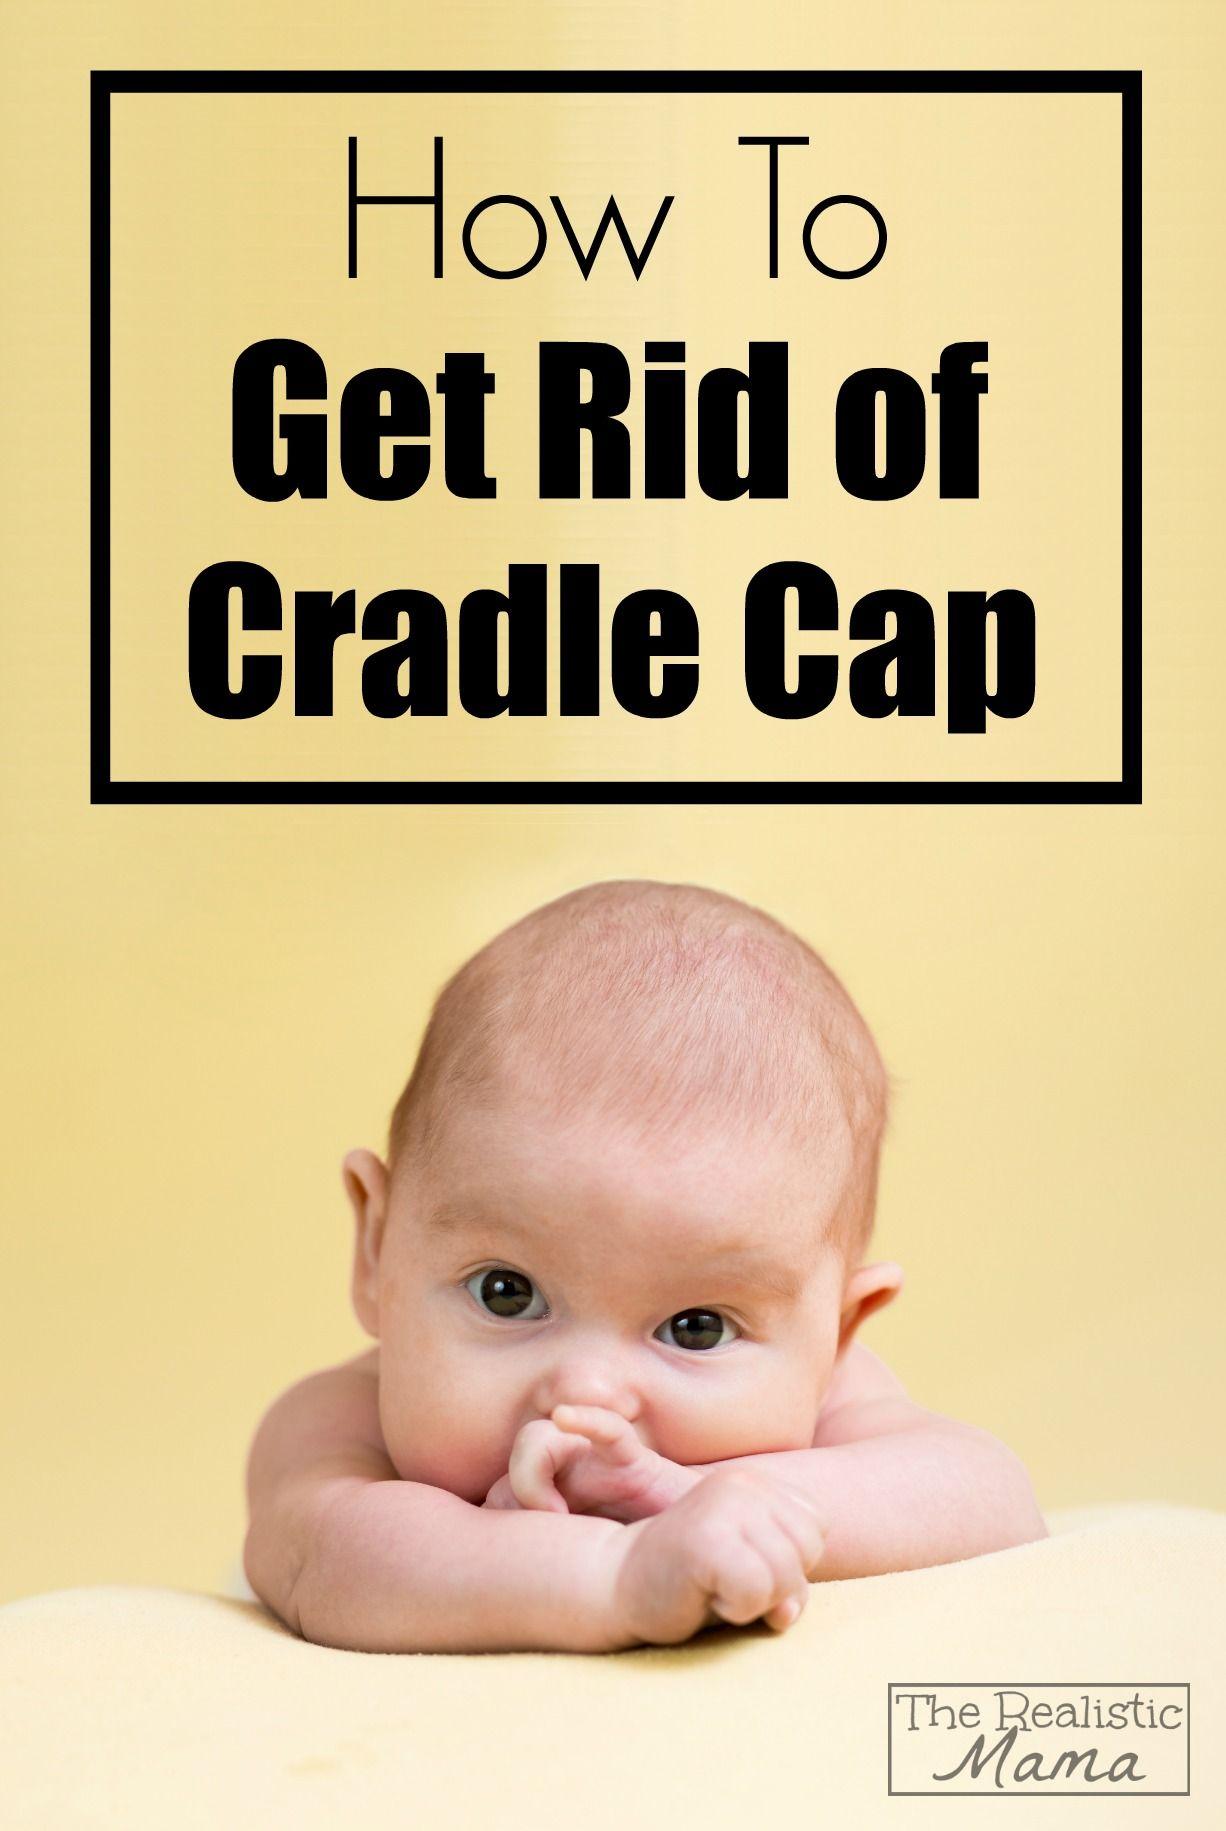 bc284d4978b How to Get Rid of Cradle Cap! So Simple!